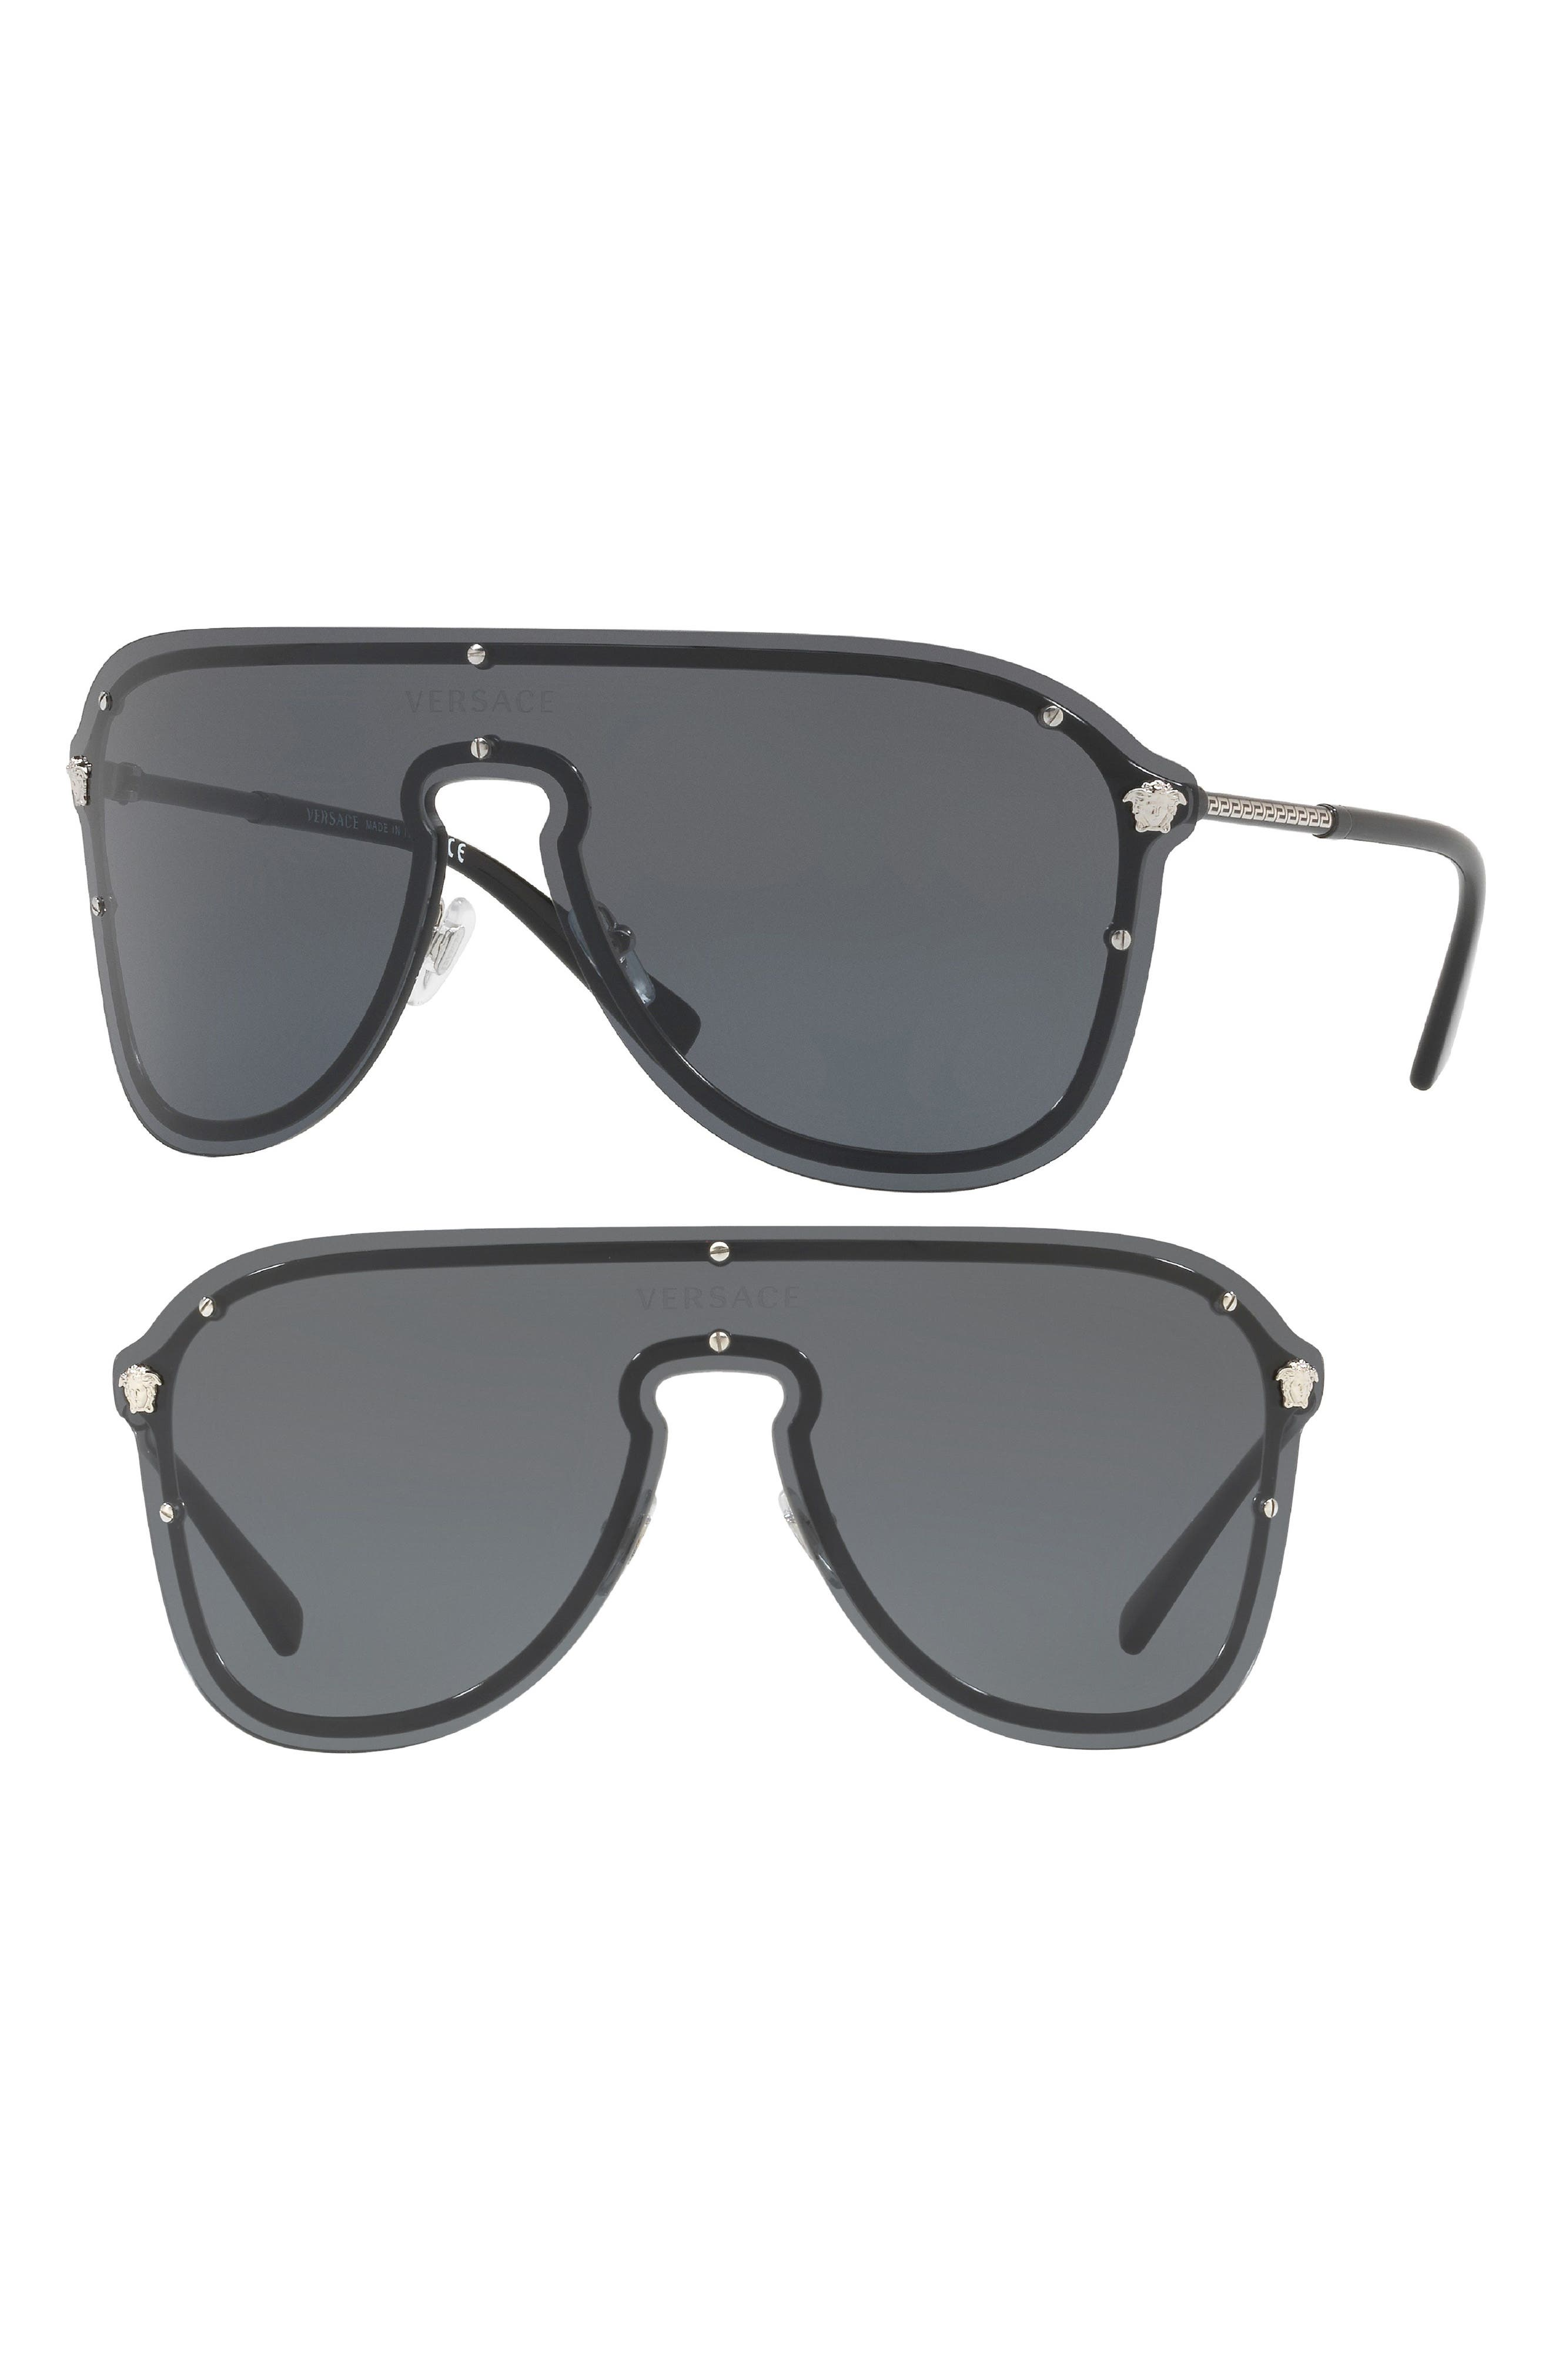 cc3db7feee Versace Sunglasses for Women